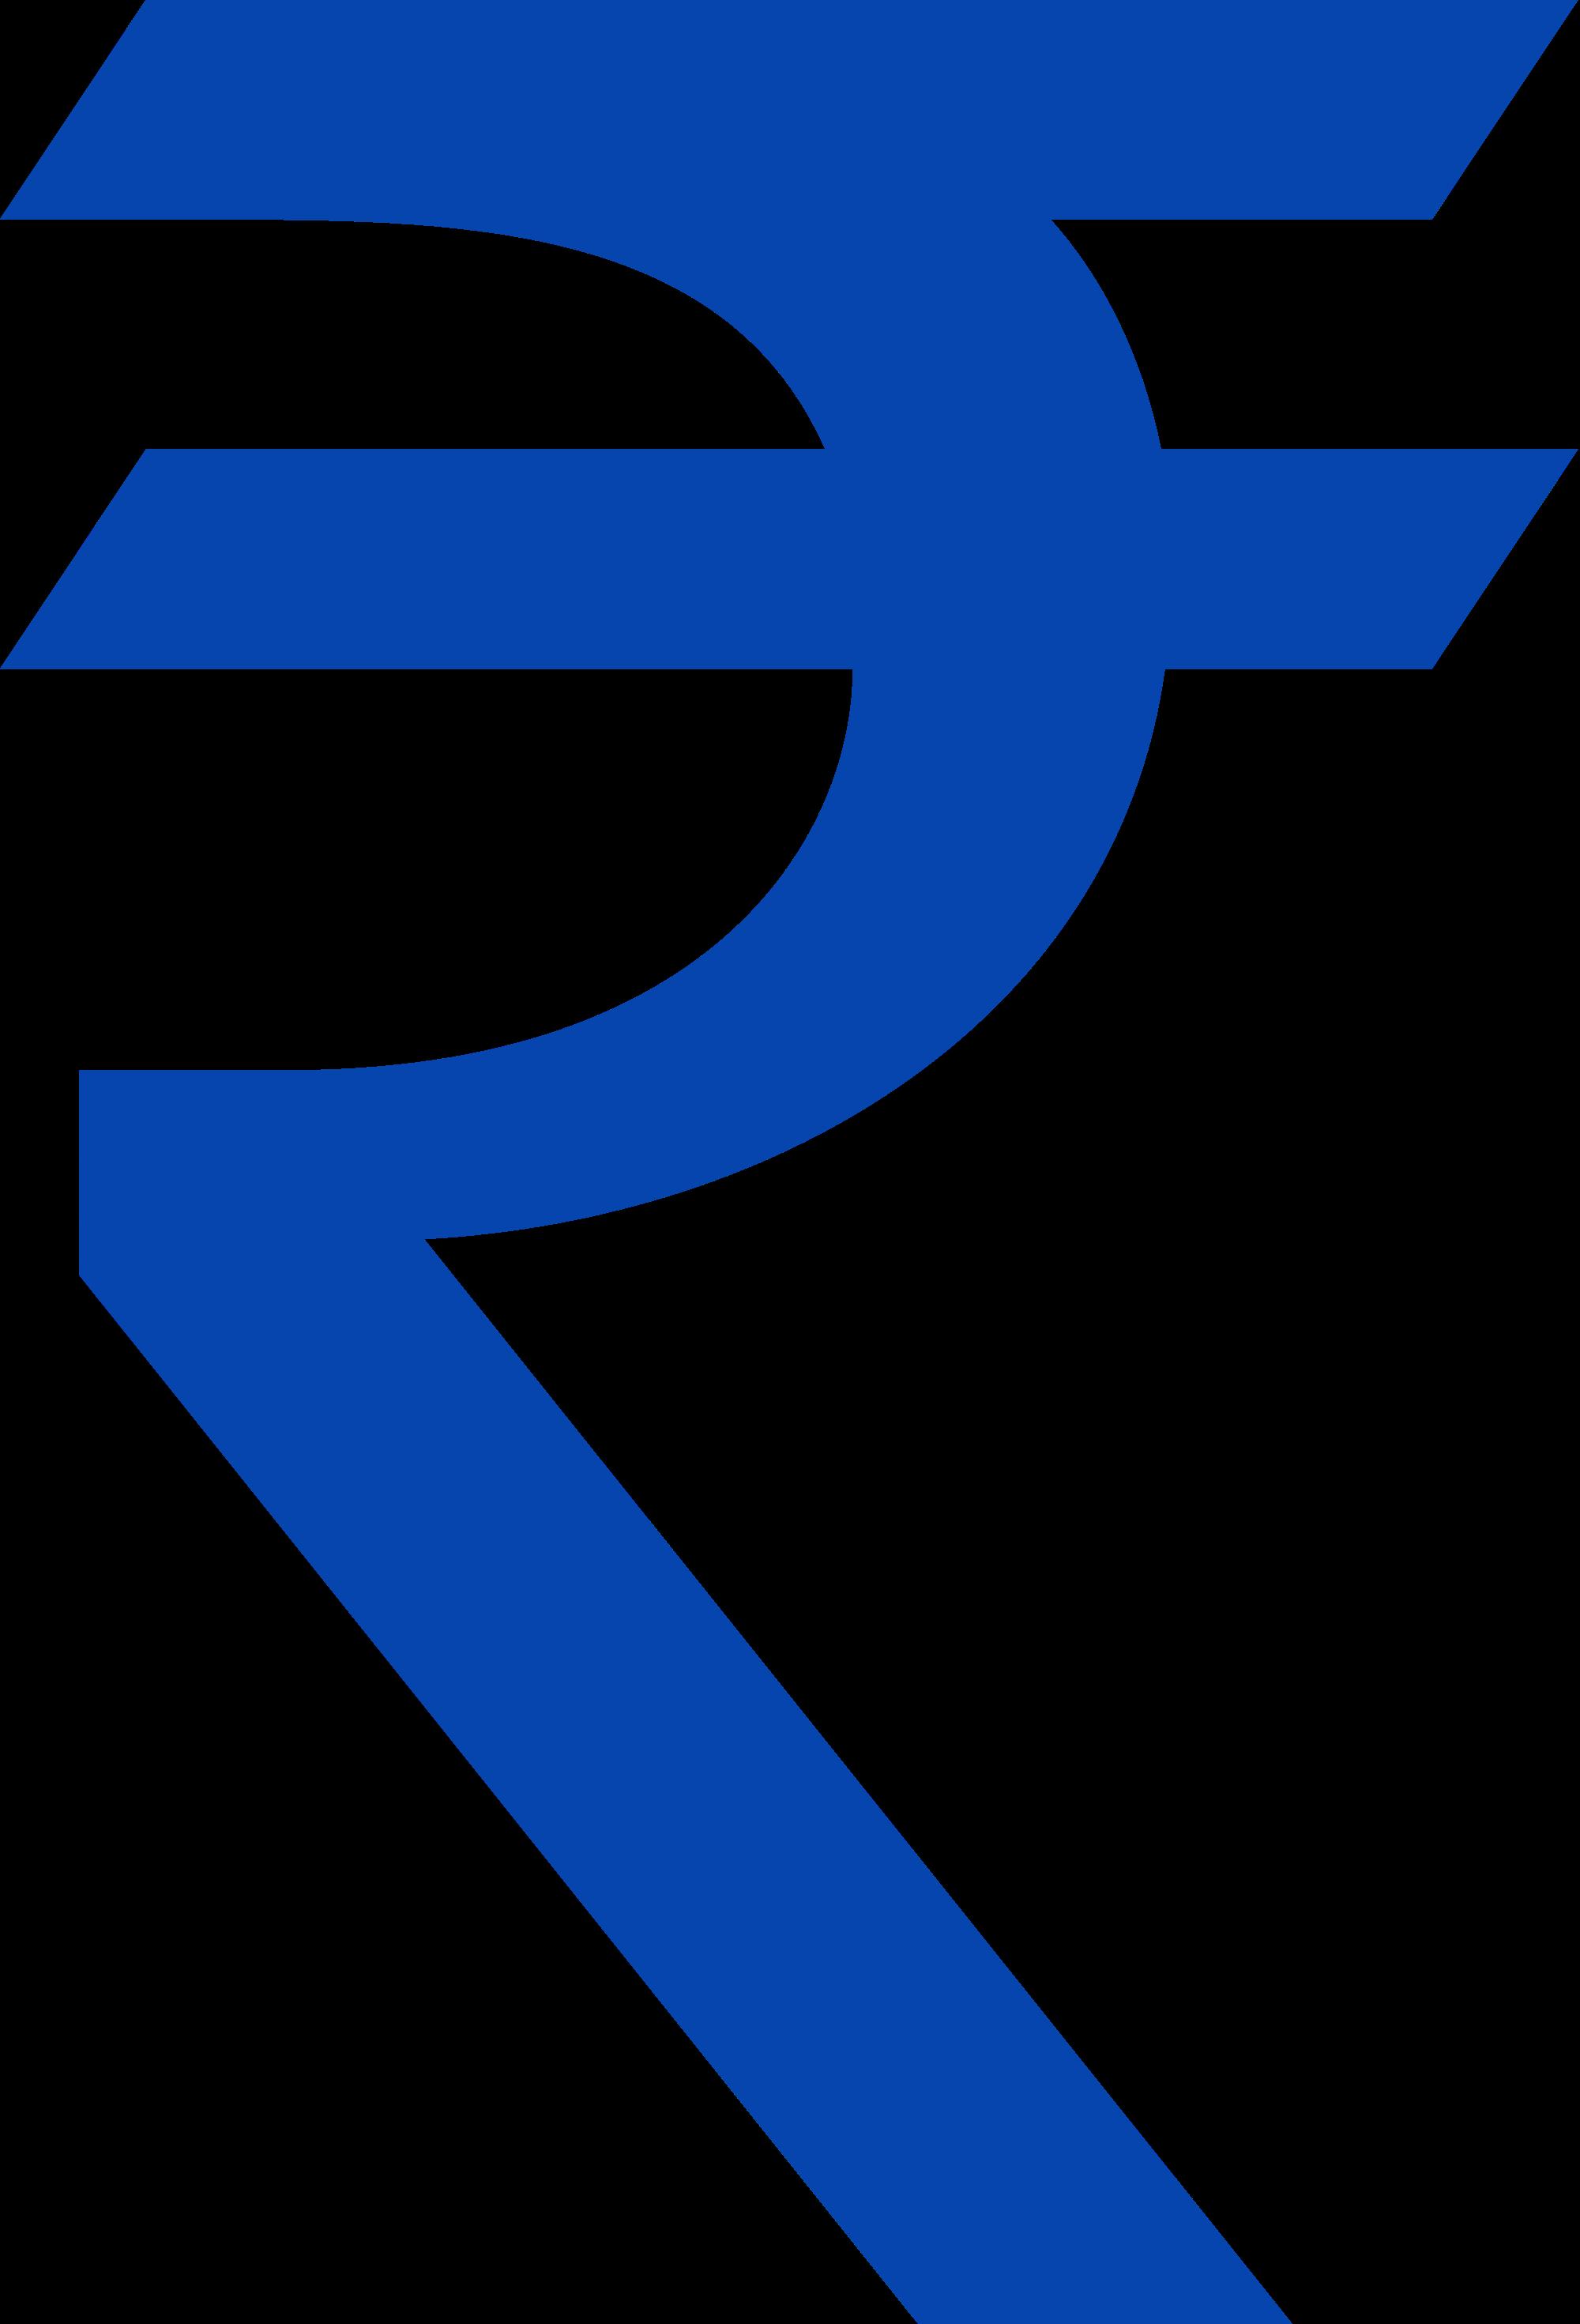 Download Rupee Symbol Photos HQ PNG Image.